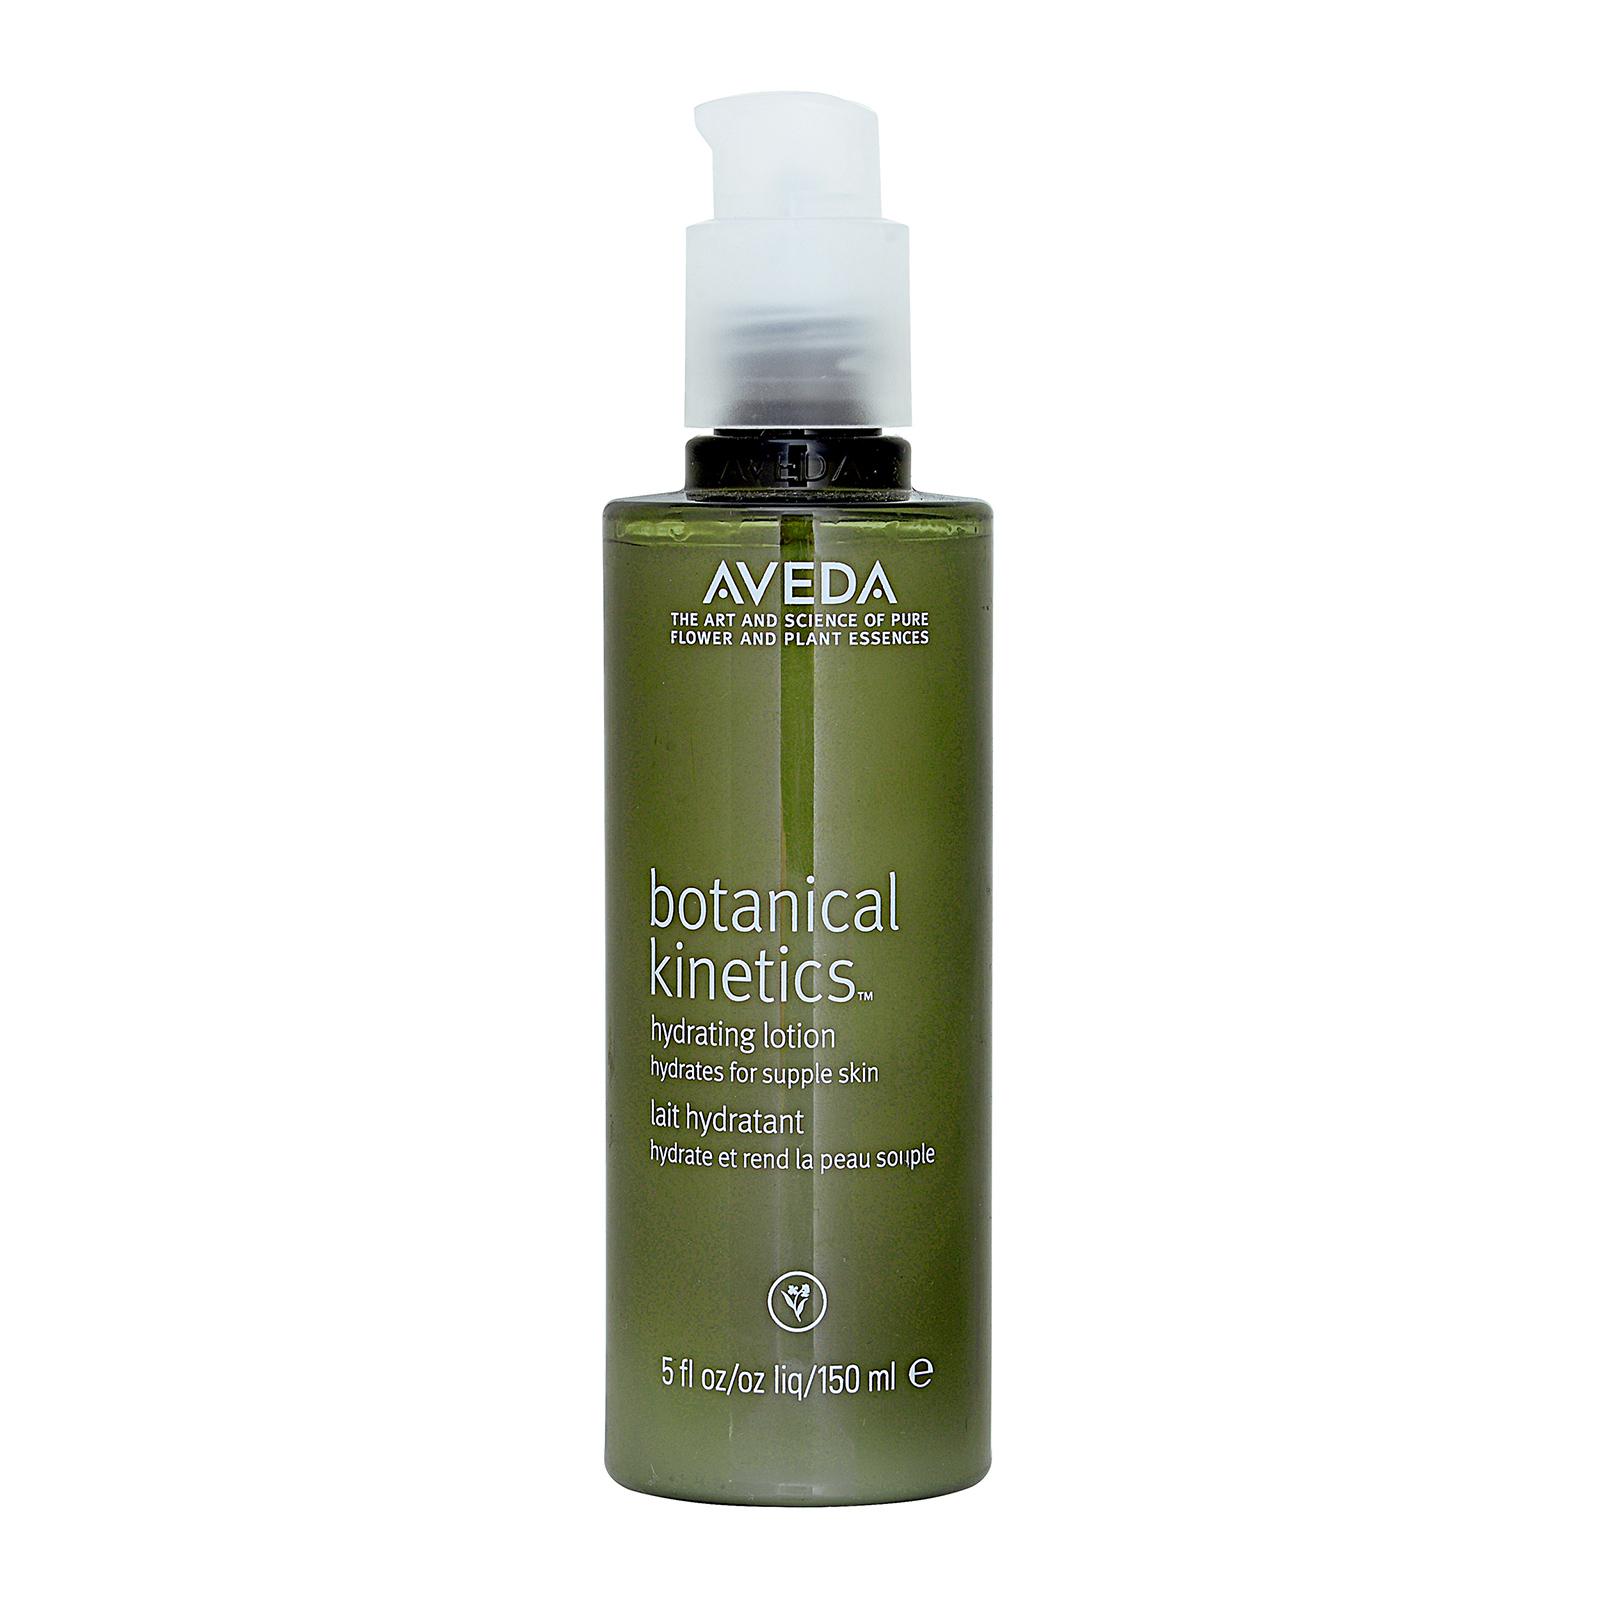 Aveda Botanical Kinetics Hydrating Lotion (for All Skin Types) 5oz, 150ml